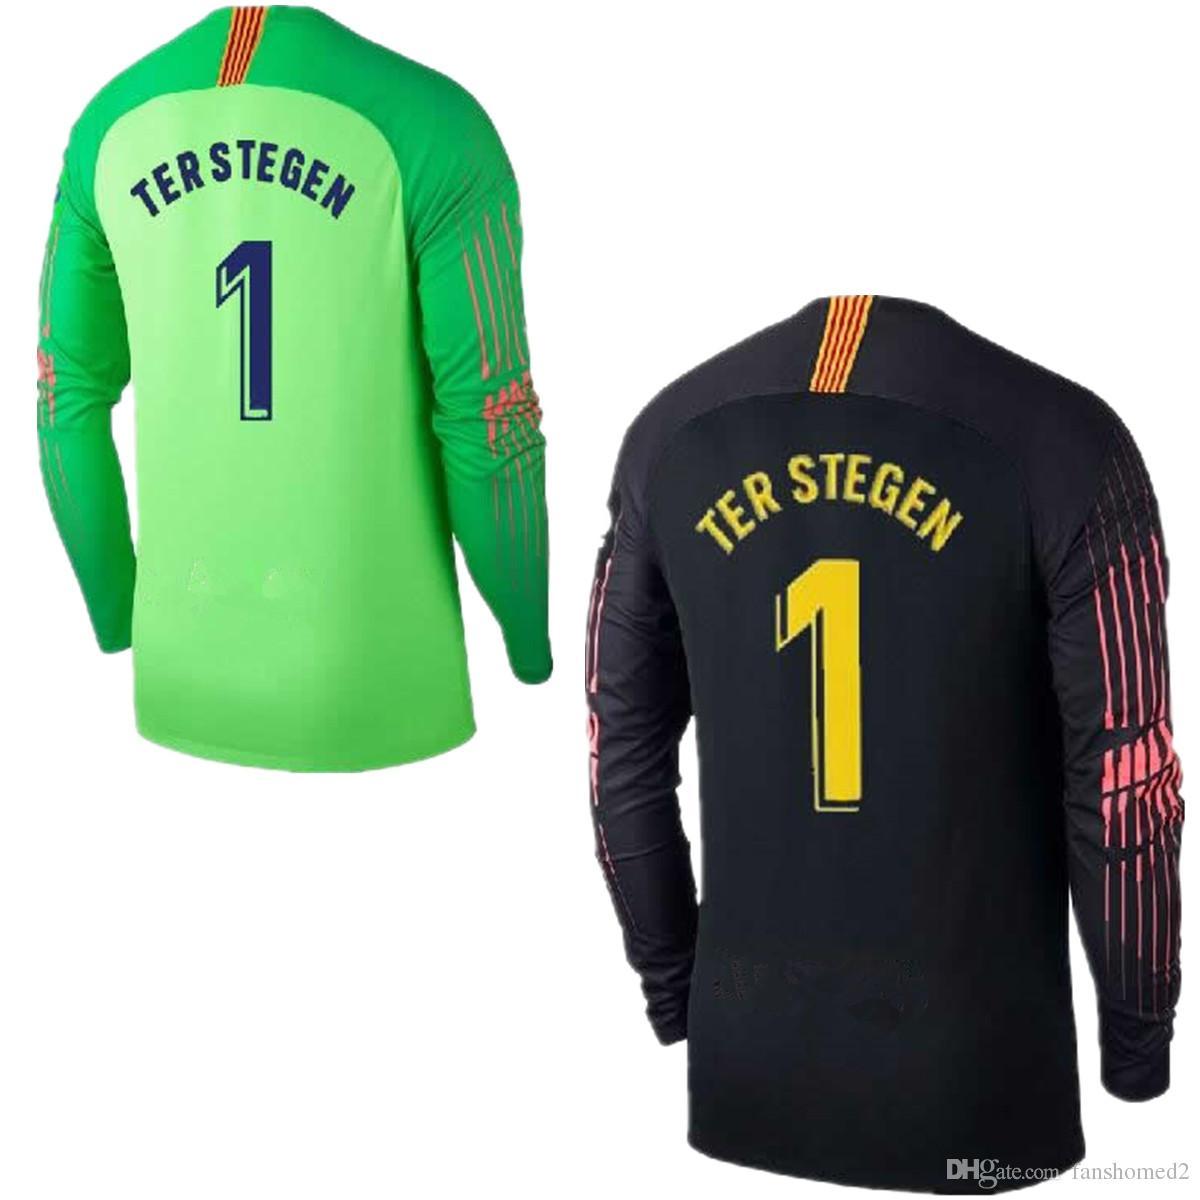 Compre 2018 2019 Adultos Camiseta De Fútbol De Manga Larga Ter Stegen  Goalkeeper Jersey   1 Marc Andre Ter Stegen Camiseta De Portero Camisetas  Negras ... 481fbf84d2148